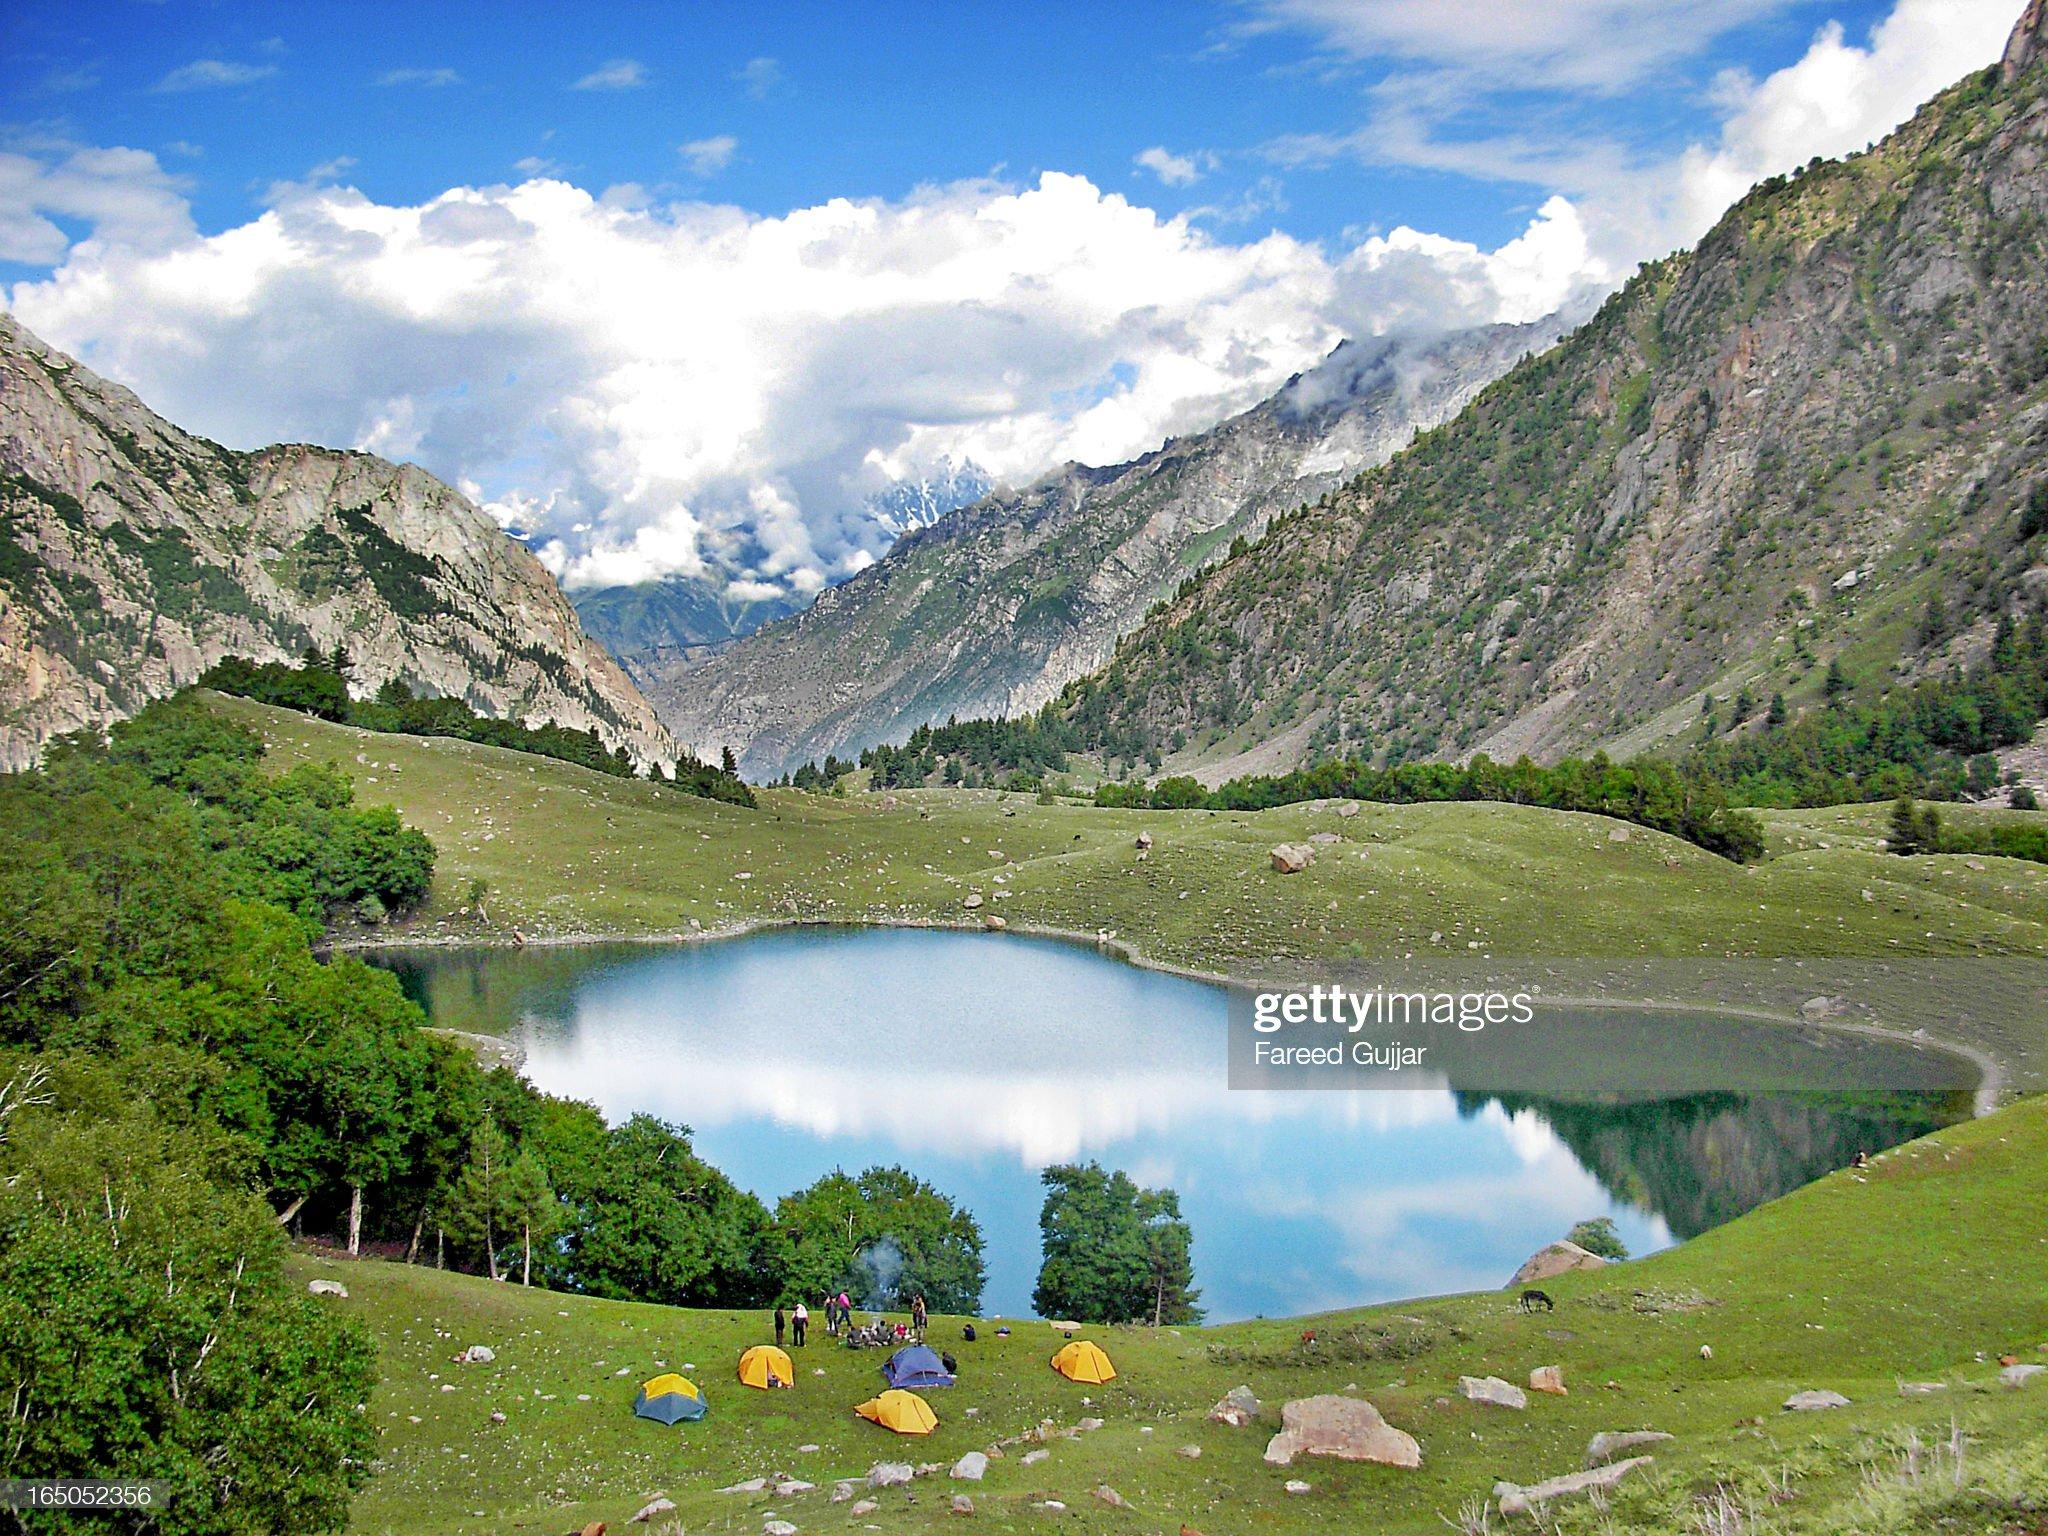 Kutwal Lake Haramosh, Gilgit-Baltistan.Travel to north, Top 10 Places To Visit In Gilgit-Baltistan.